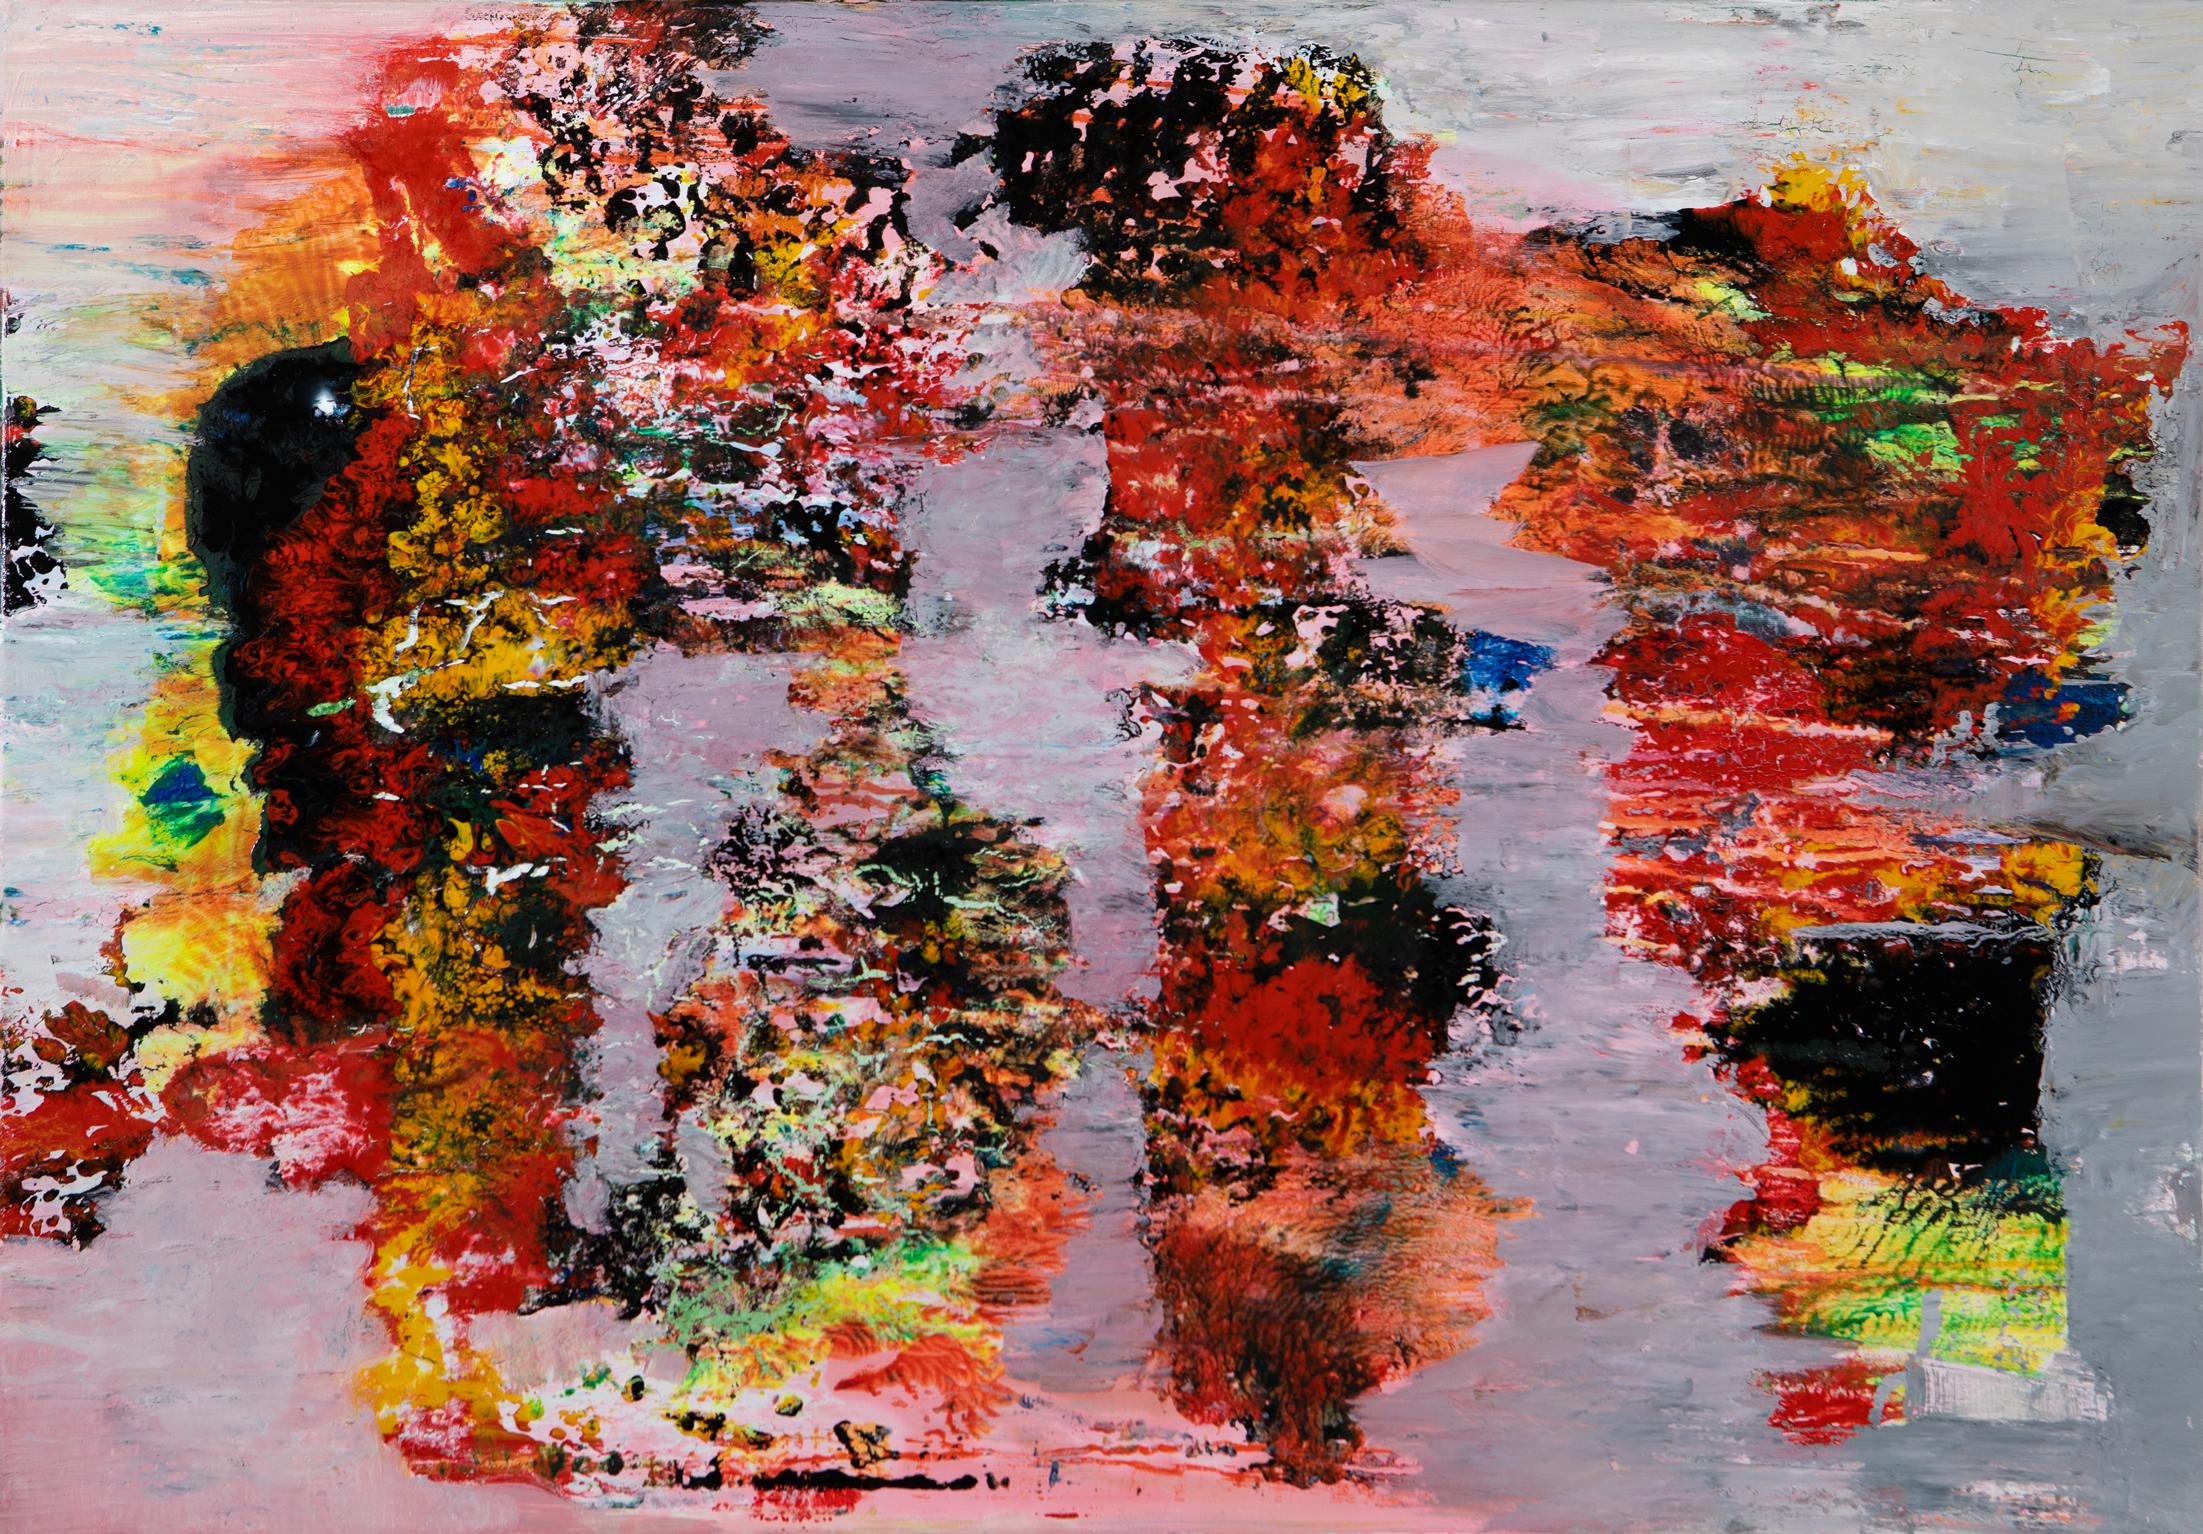 - 2019Acryl auf Leinwand70 x 100 cm